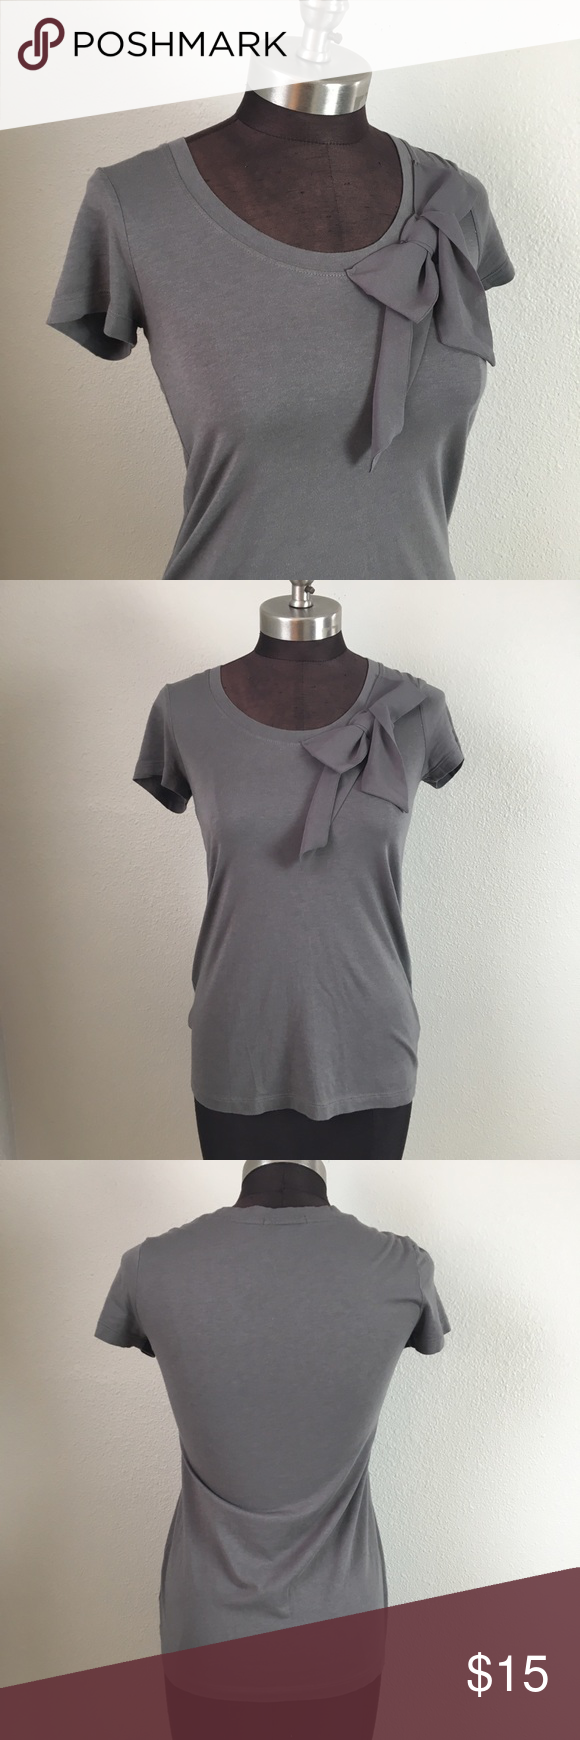 7d3f0379f9650 Womens Pima Cotton T Shirts - BCD Tofu House